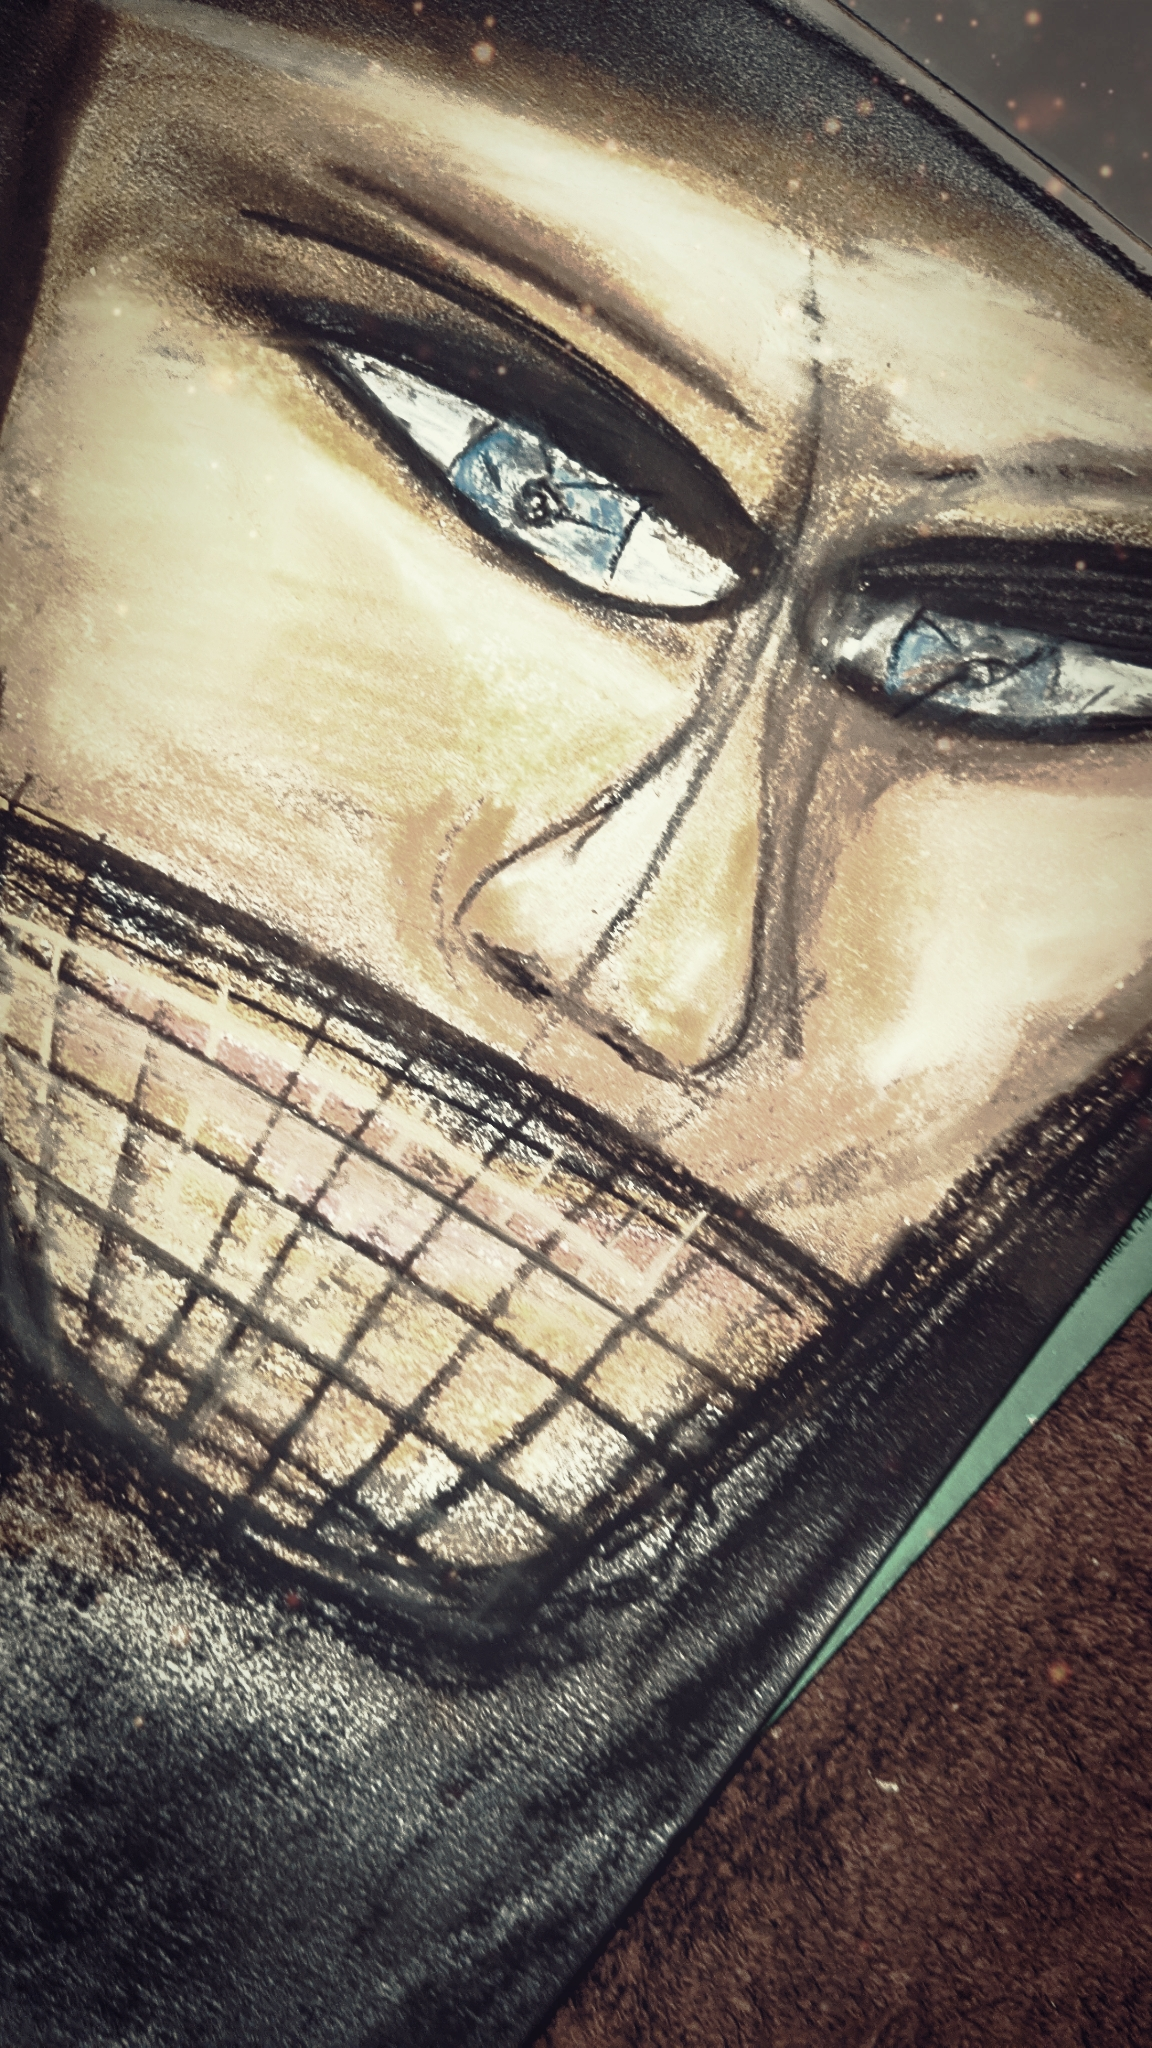 Artwork by Gary Crossey - Masked 2020